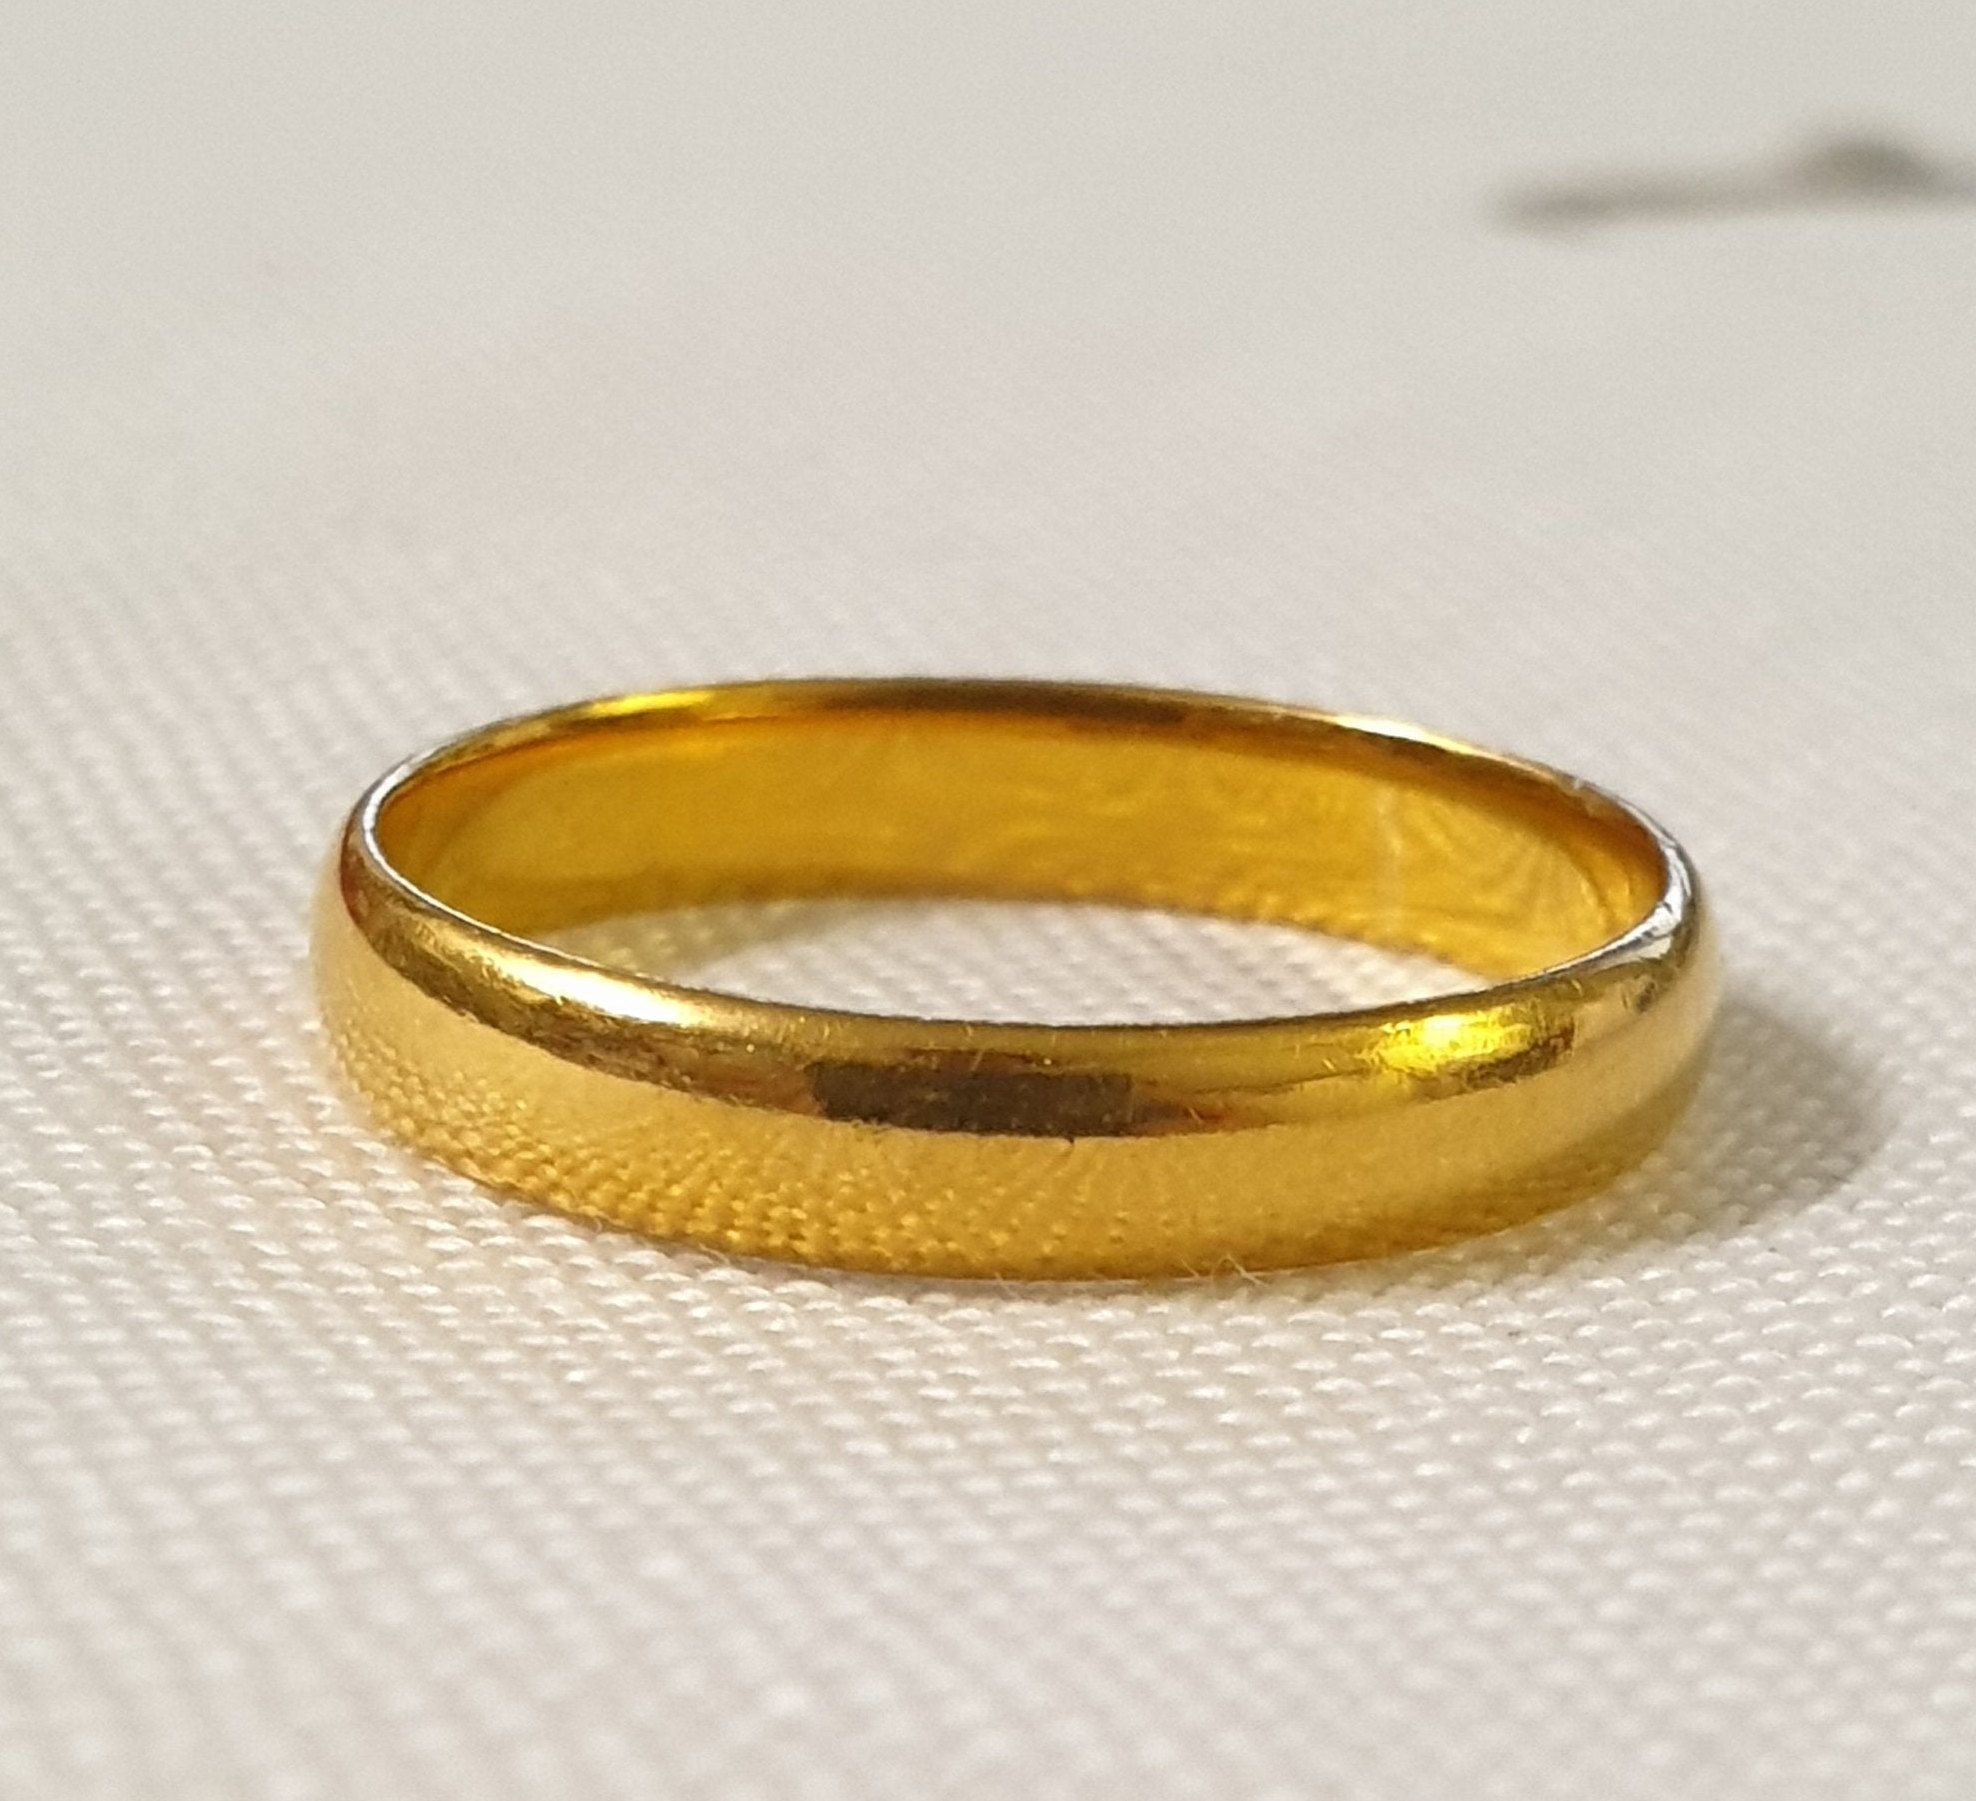 22ct Ring Gold Wedding Band Vintage 1955 Wedding Jewellery Womens Wedding Ring Bridal Sz L Wedding Jewelry Antique Jewelry Gold Ring In 2020 Gold Wedding Band Gold Rings Jewelry Vintage Wedding Band